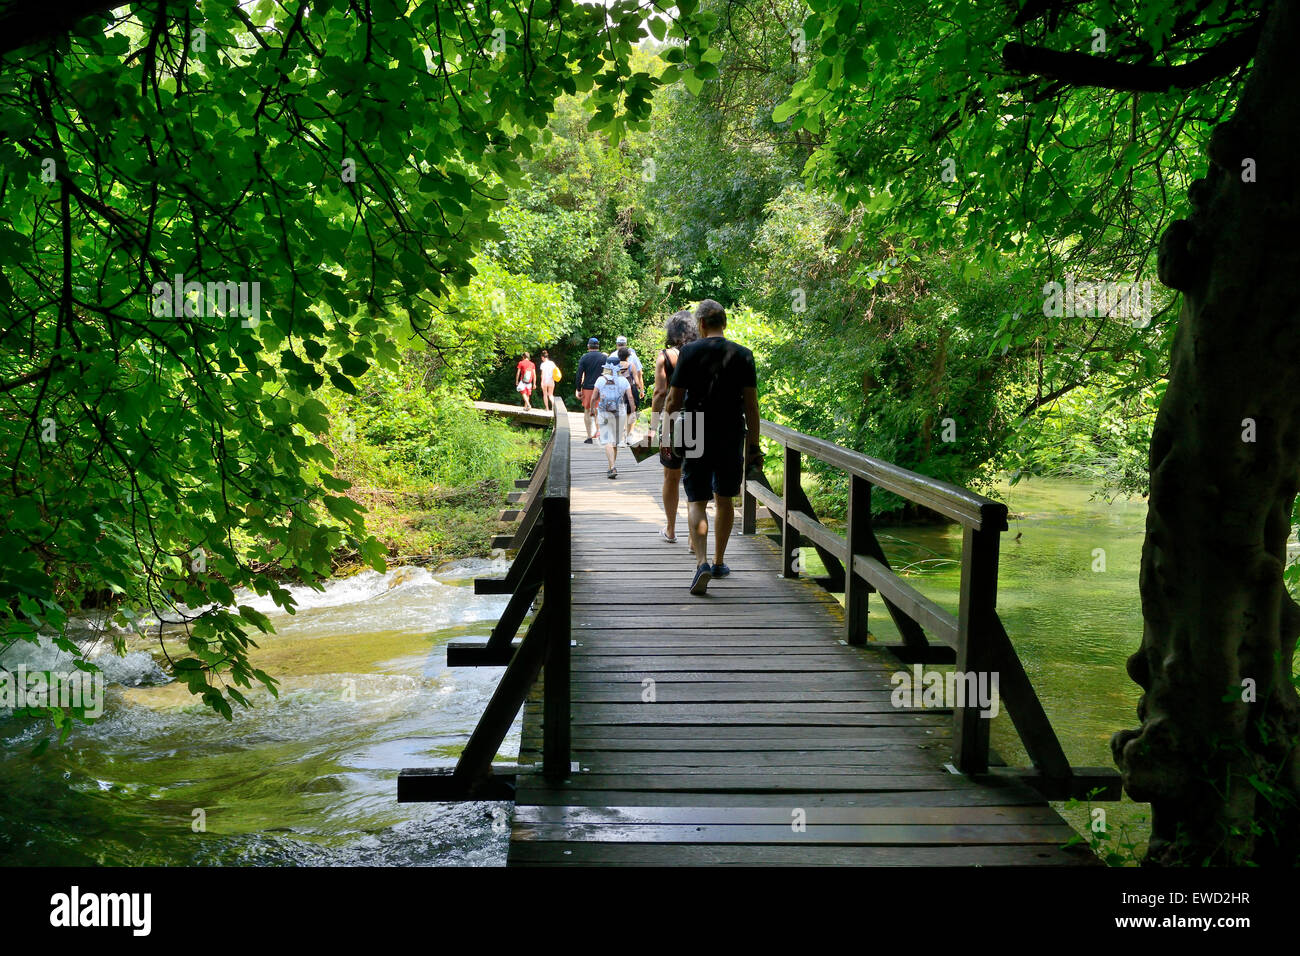 Tourists on boardwalk at Skradinski Buk waterfalls, Krka National Park on Dalmatian Coast of Croatia Stock Photo